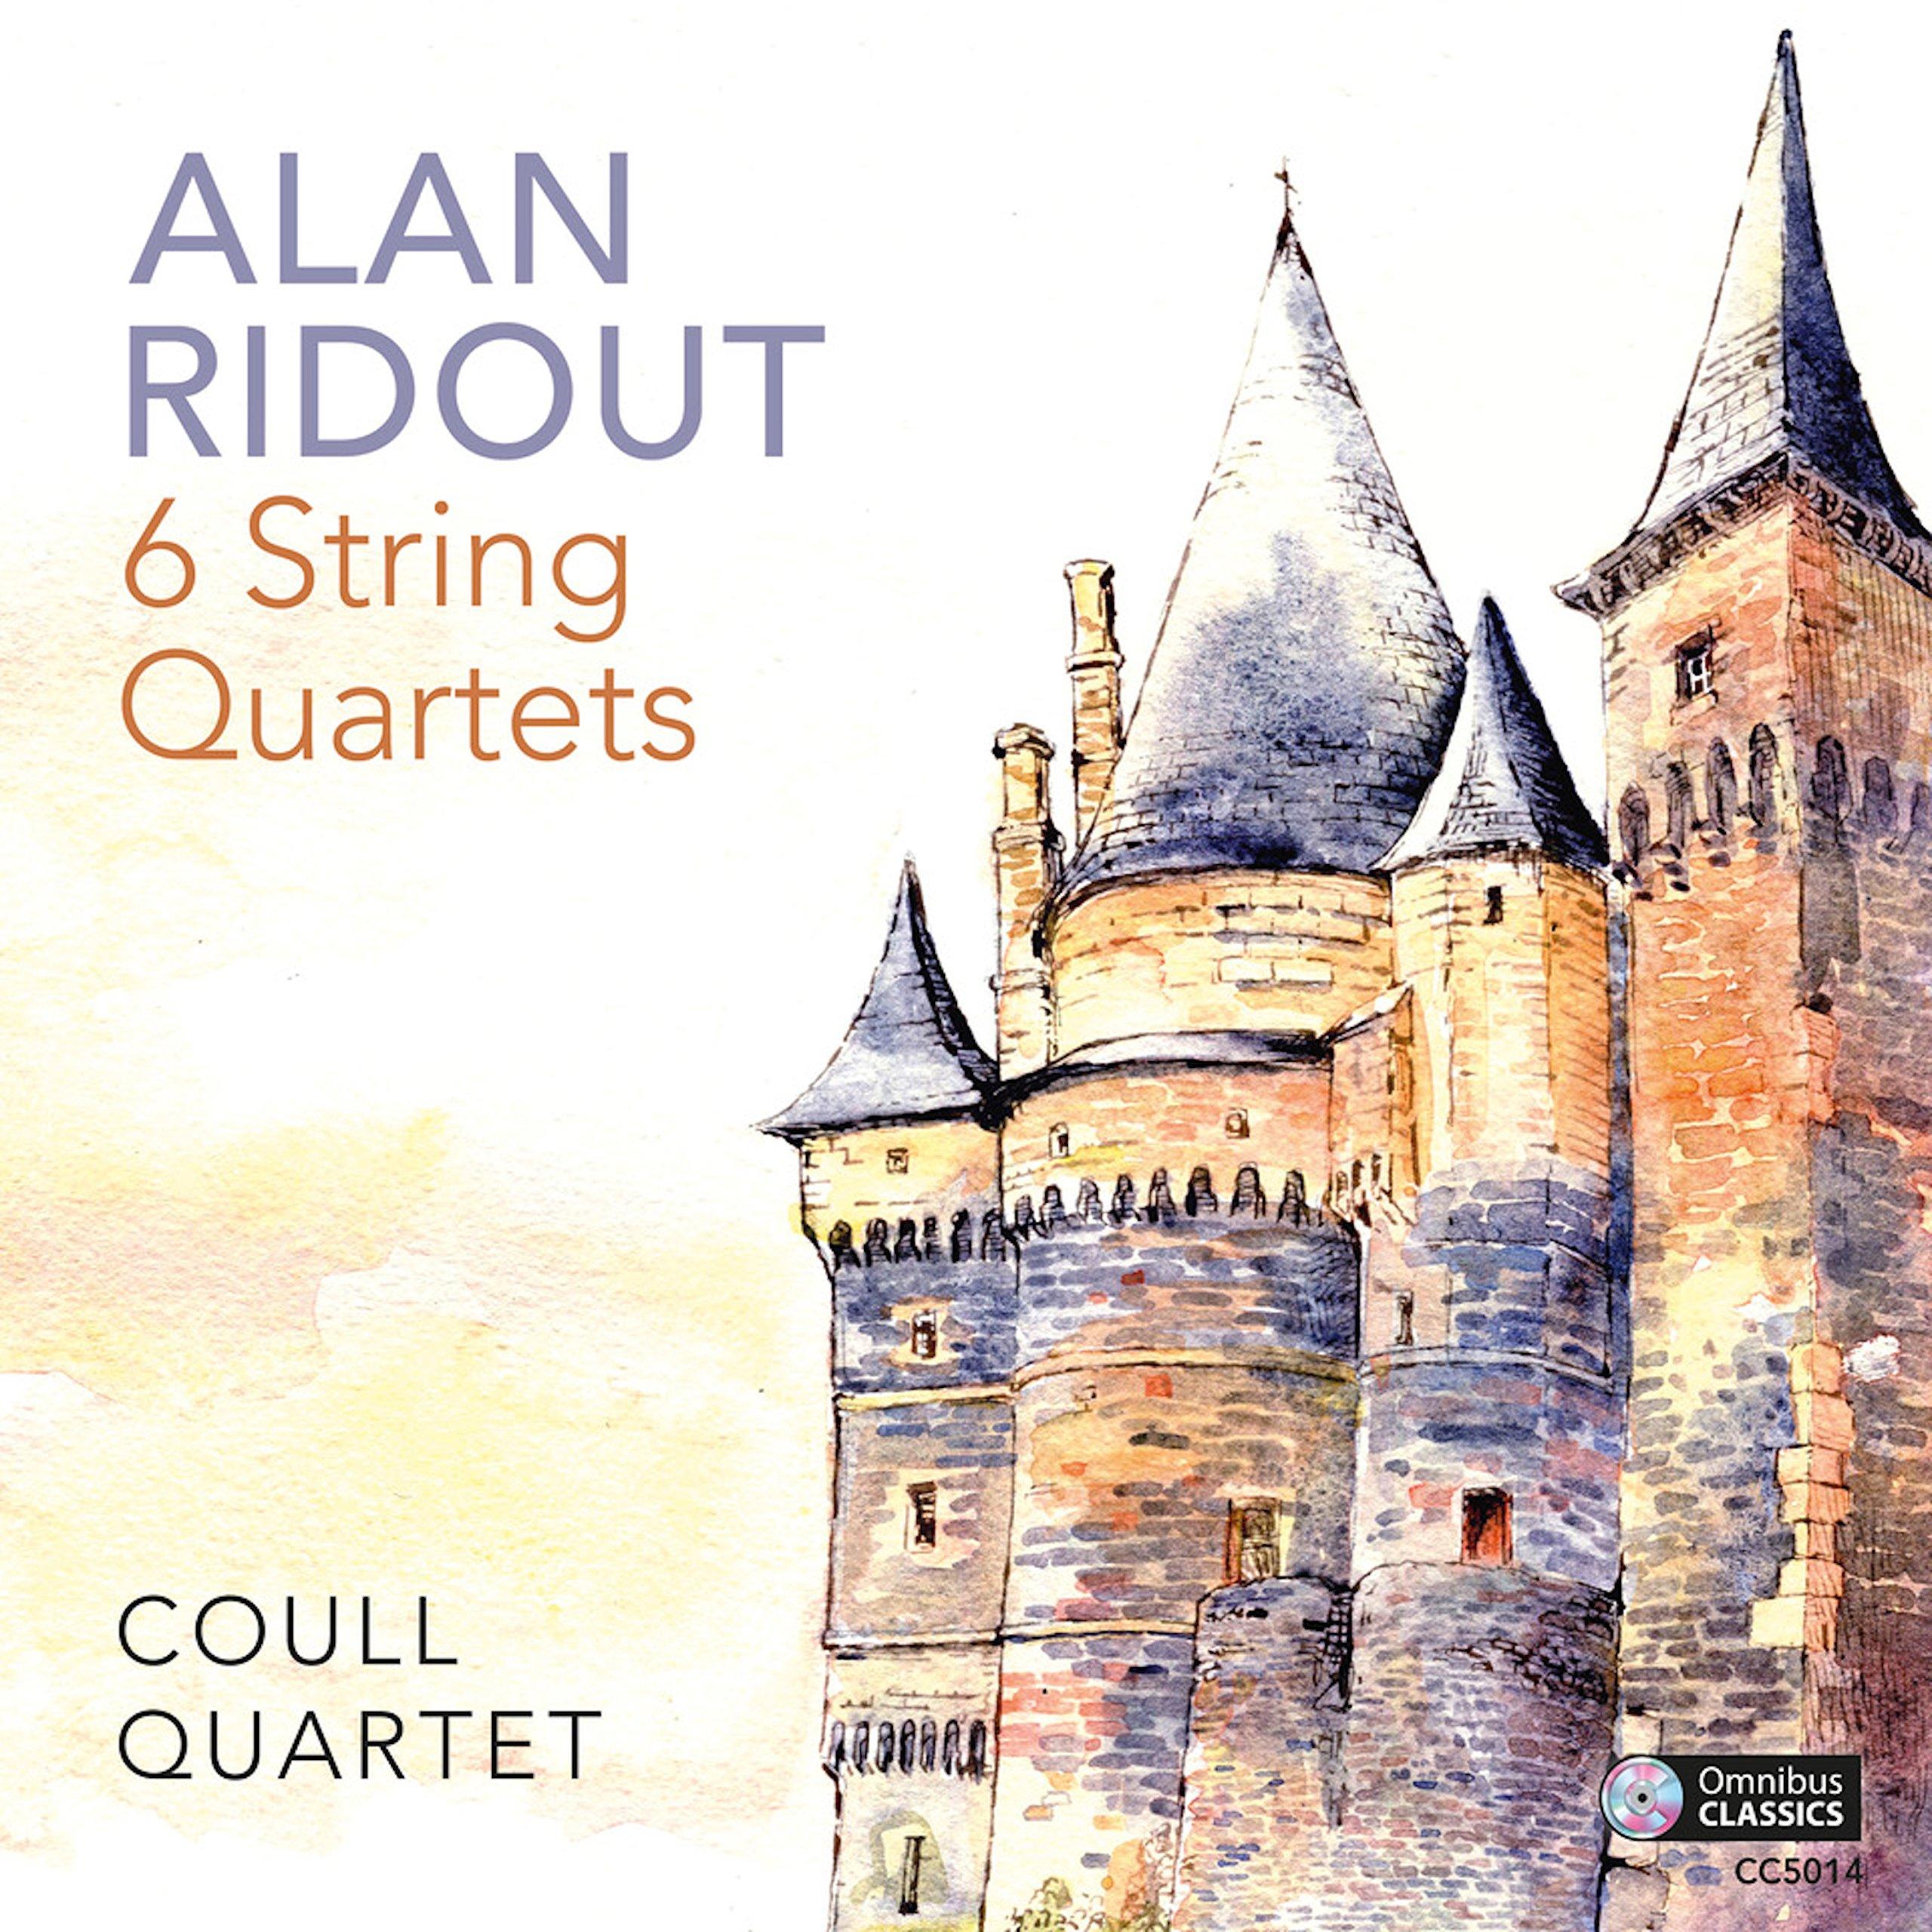 CD : Coull Quartet - 6 String Quartets (CD)